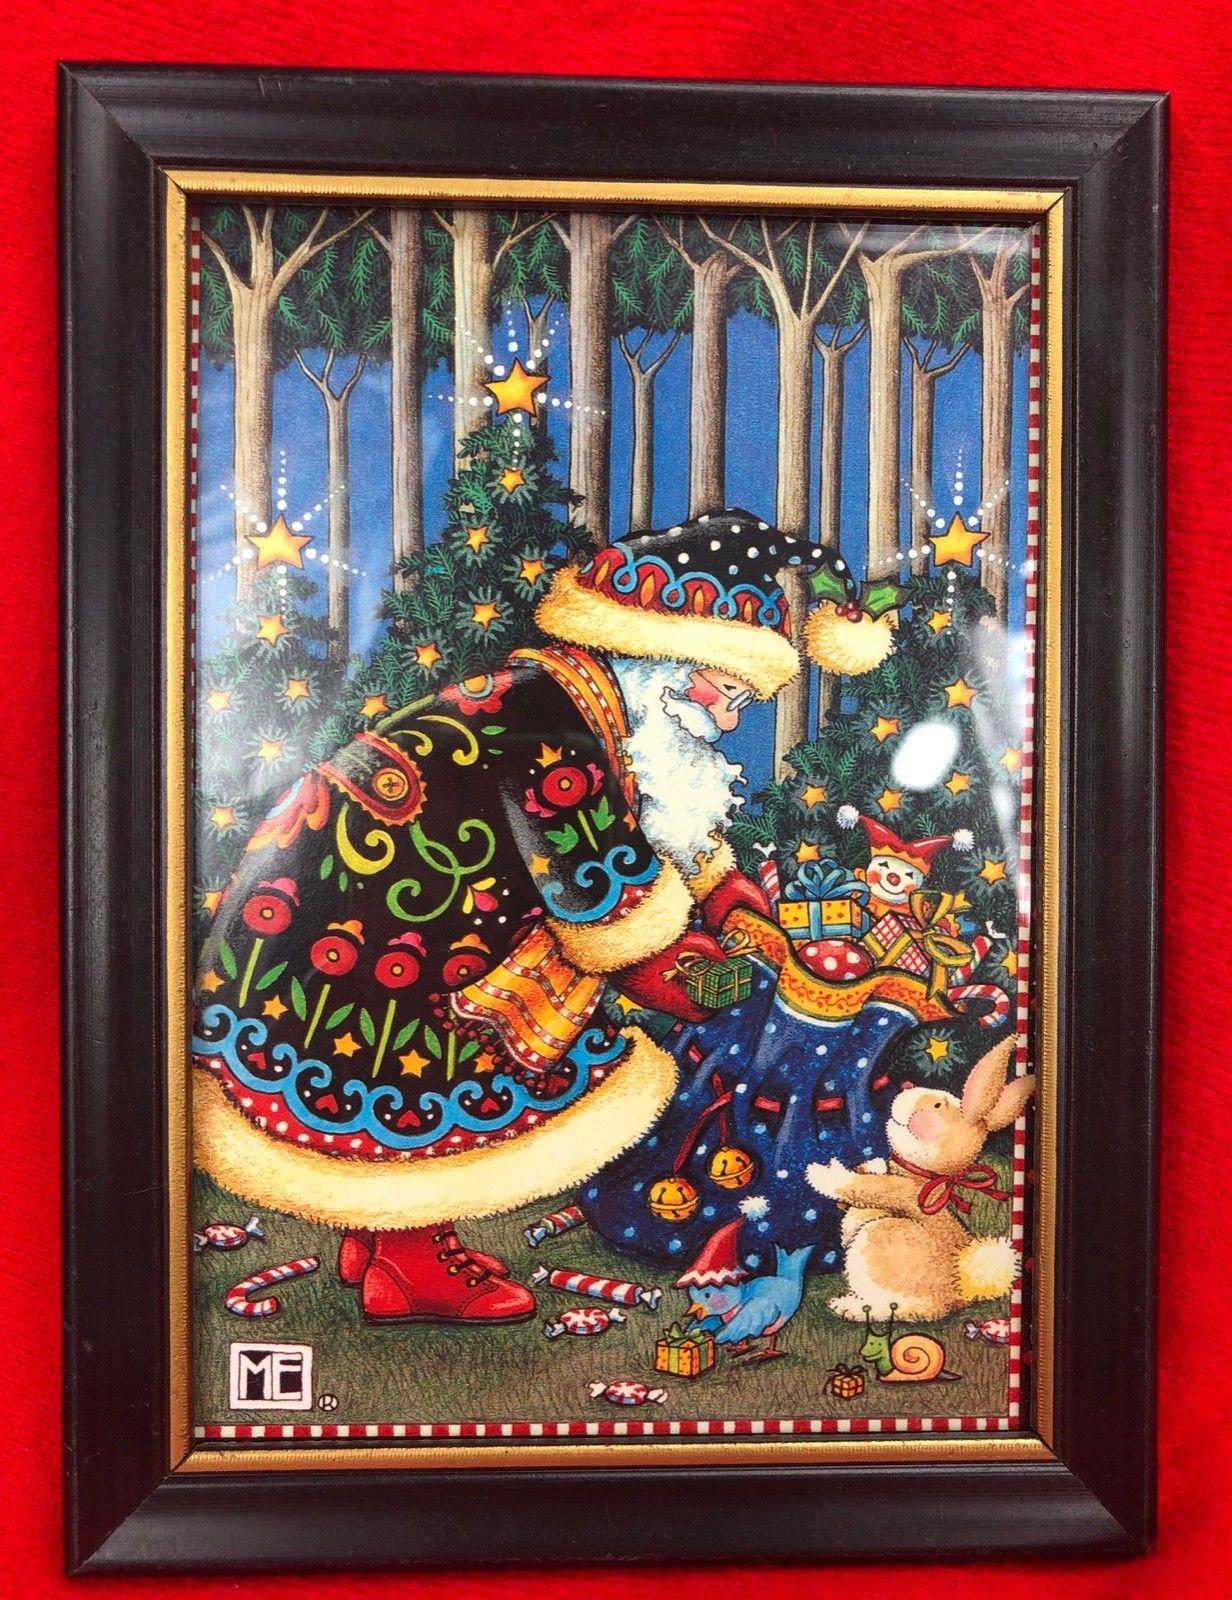 "MARY ENGELBREIT CHRISTMAS ME FRAMED PRINT PICTURE Santa w/ Toy Sack 7.5""x5.5"""